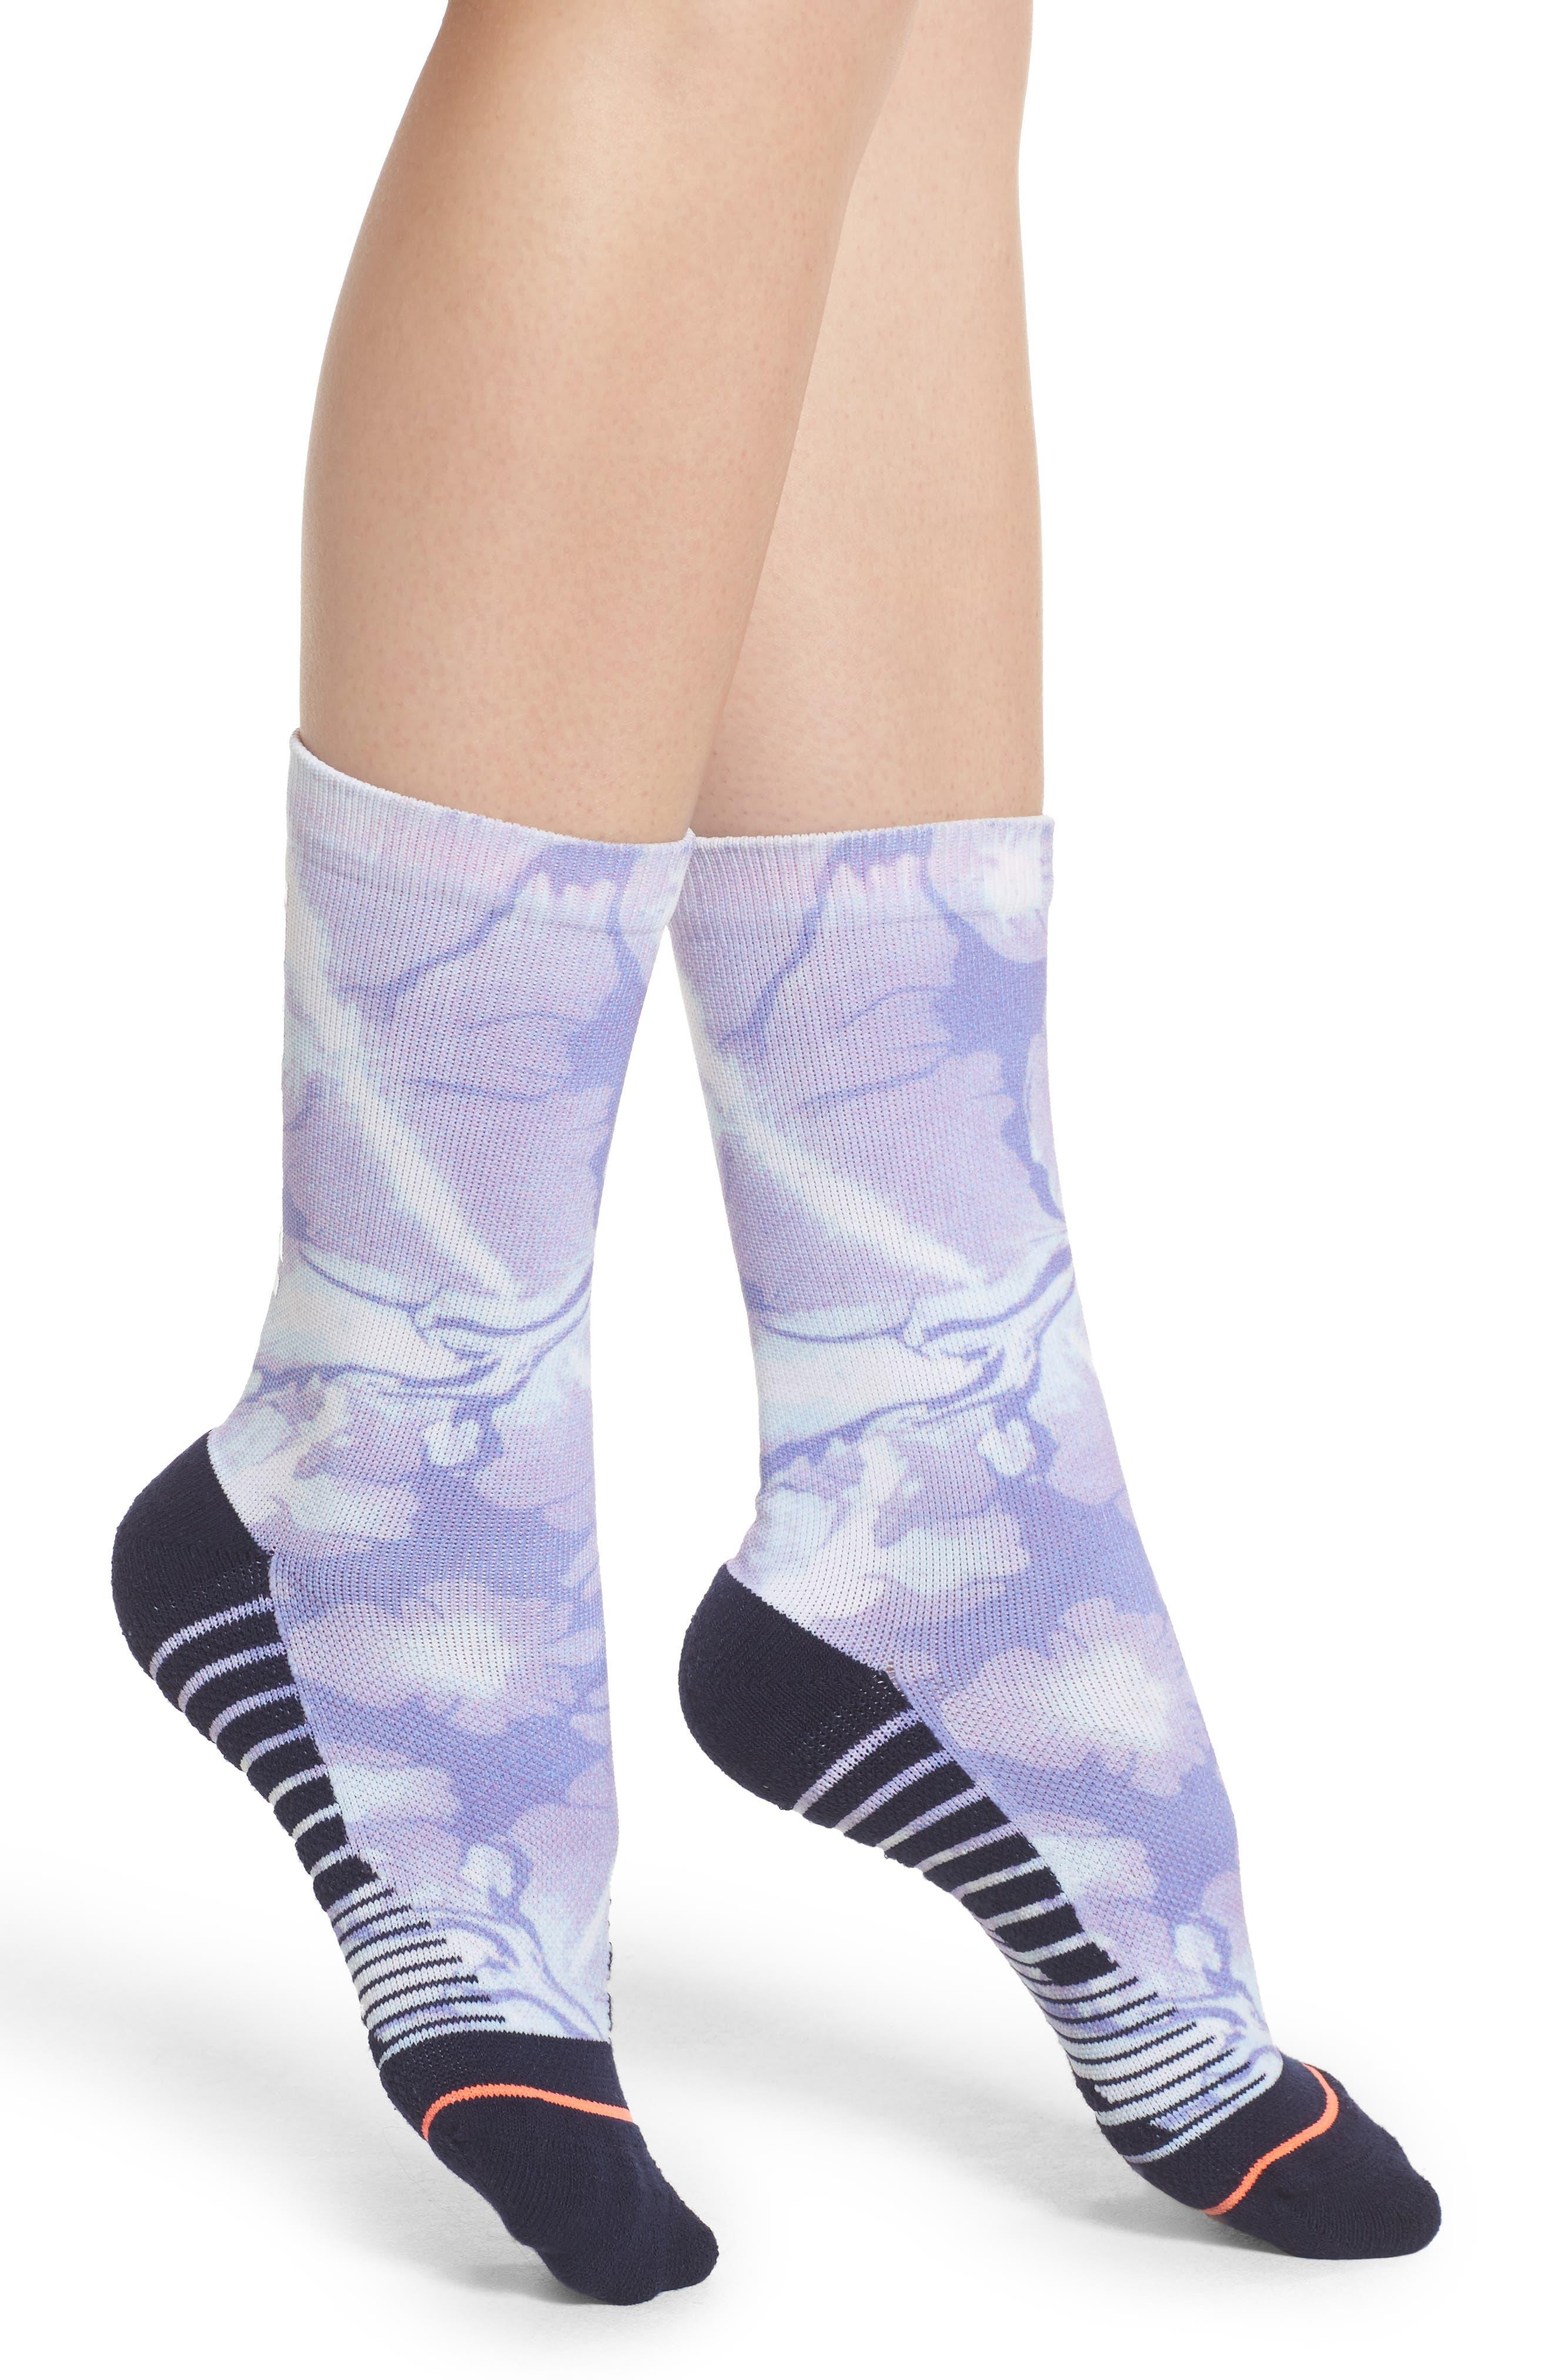 Squat Goals Training Socks,                         Main,                         color, 500